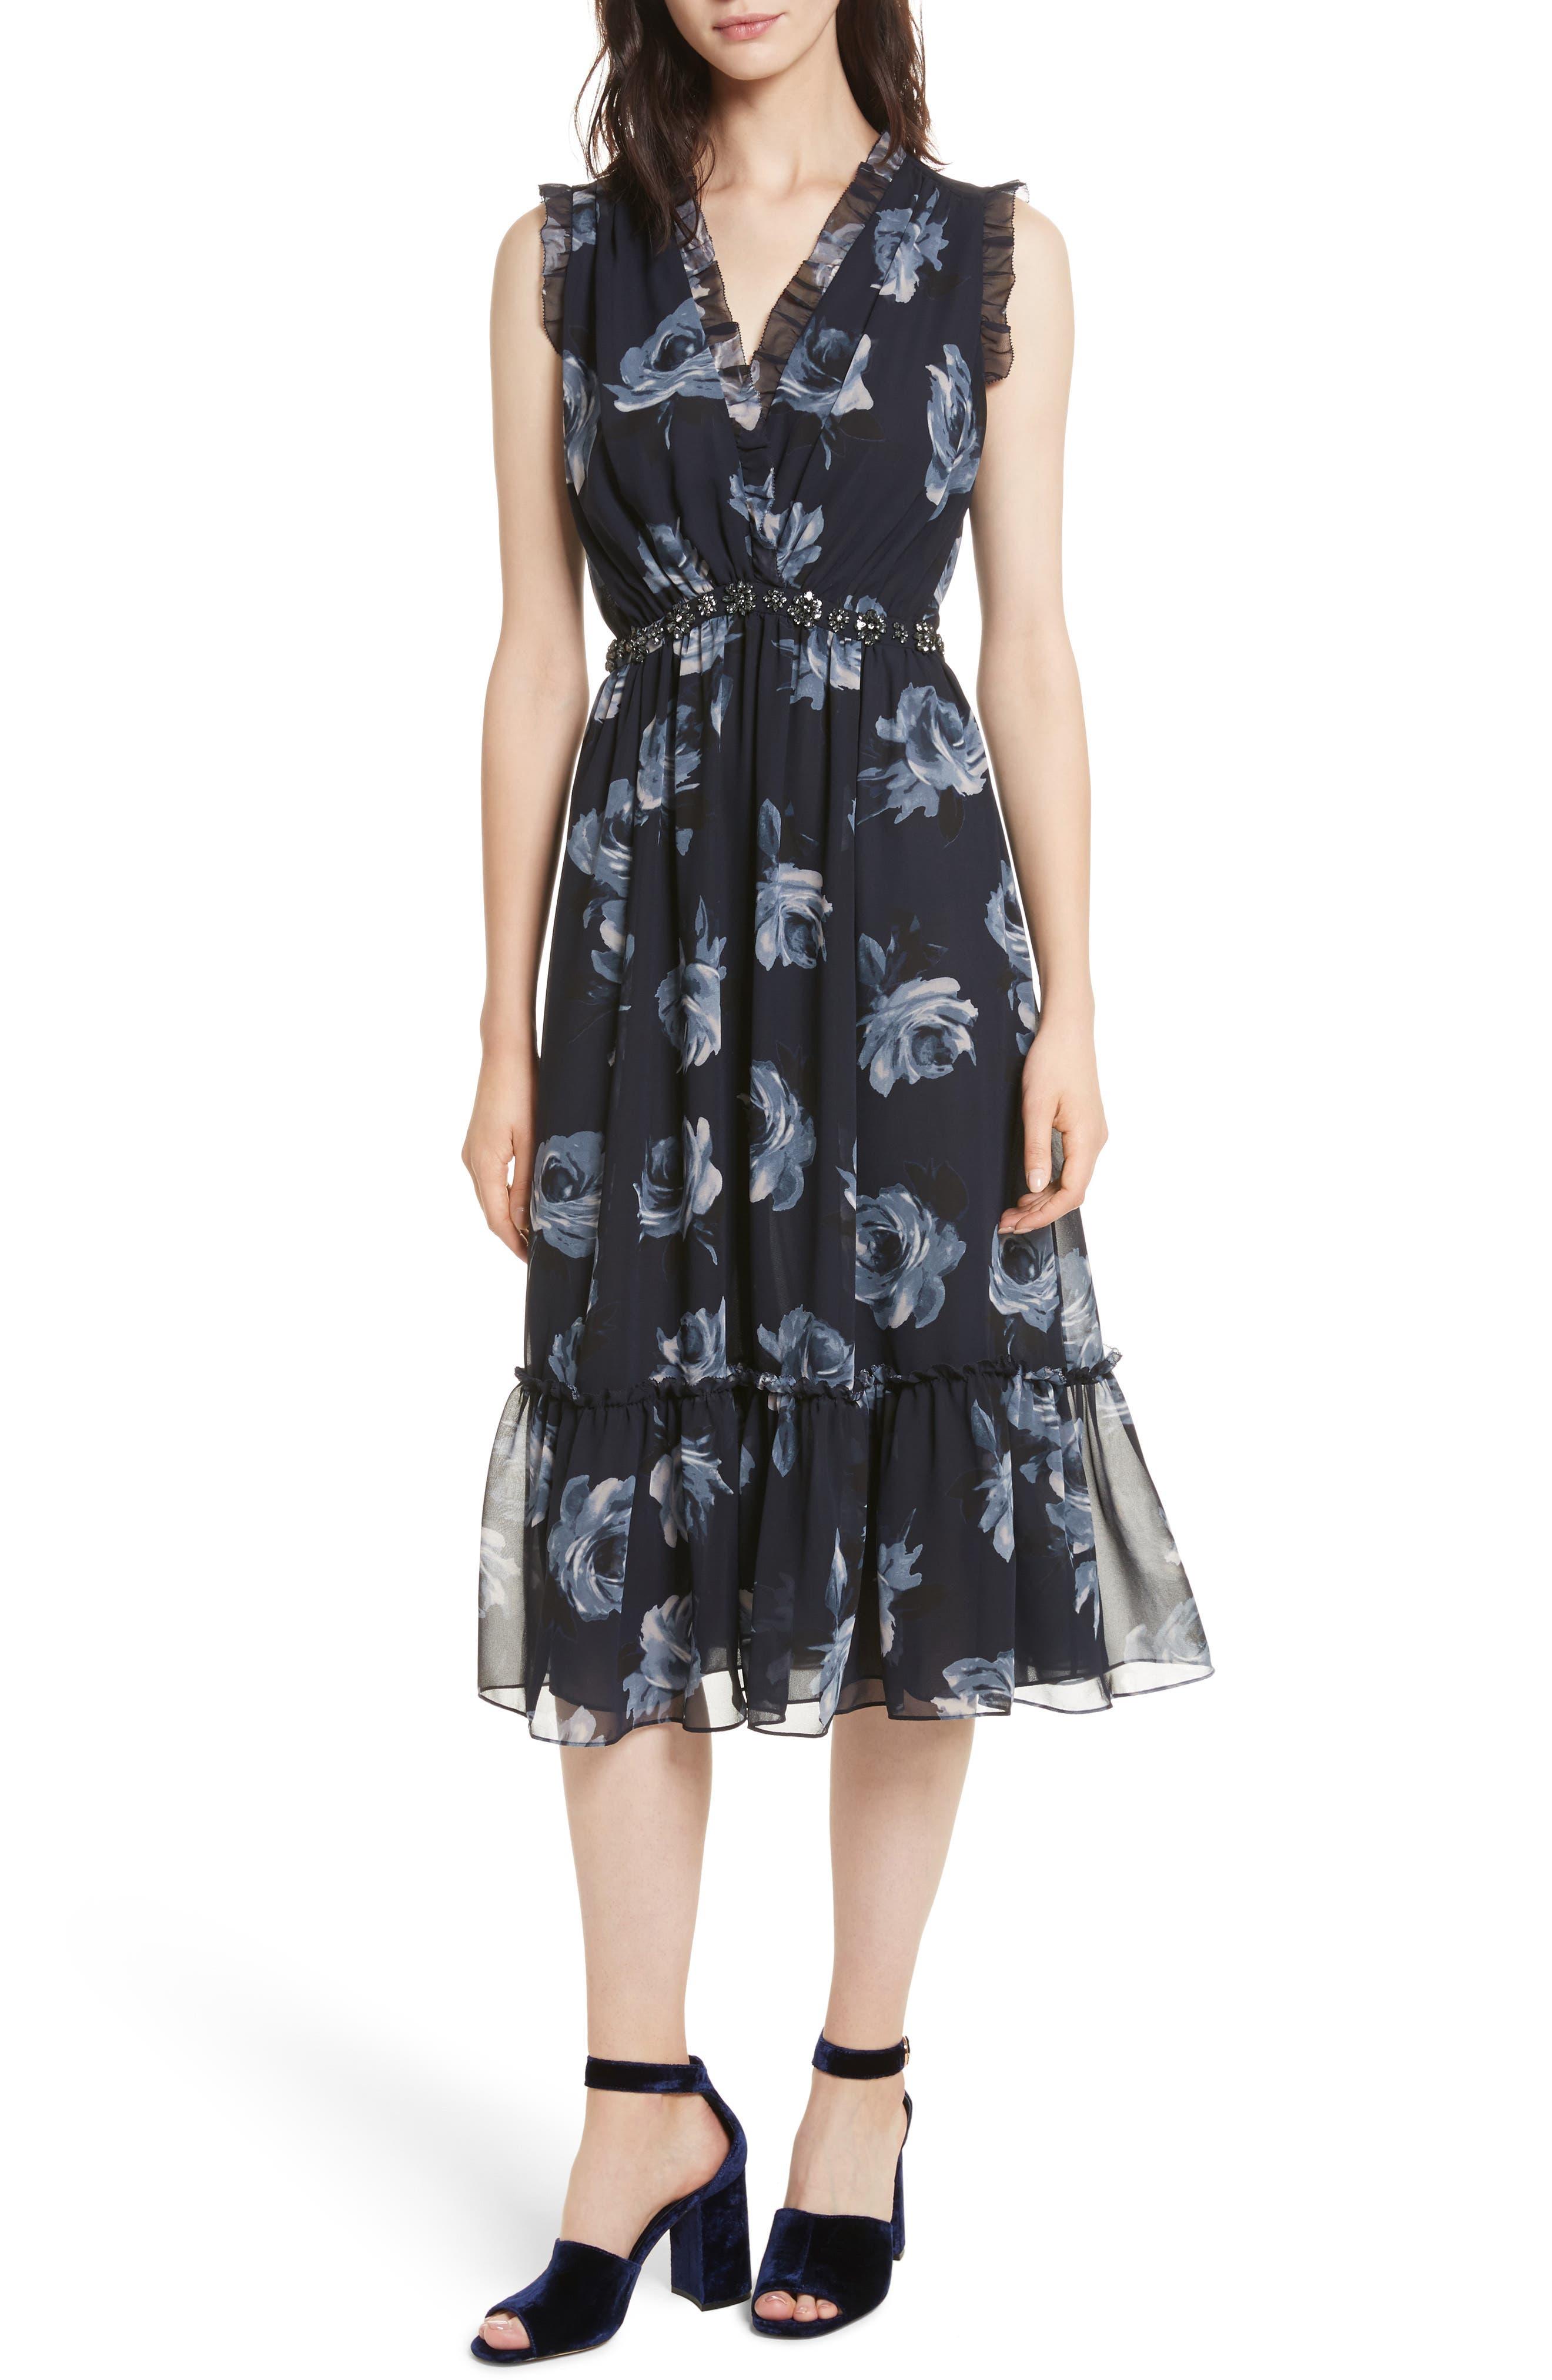 kade spade new york Night Rose Chiffon Midi Dress,                             Main thumbnail 1, color,                             473